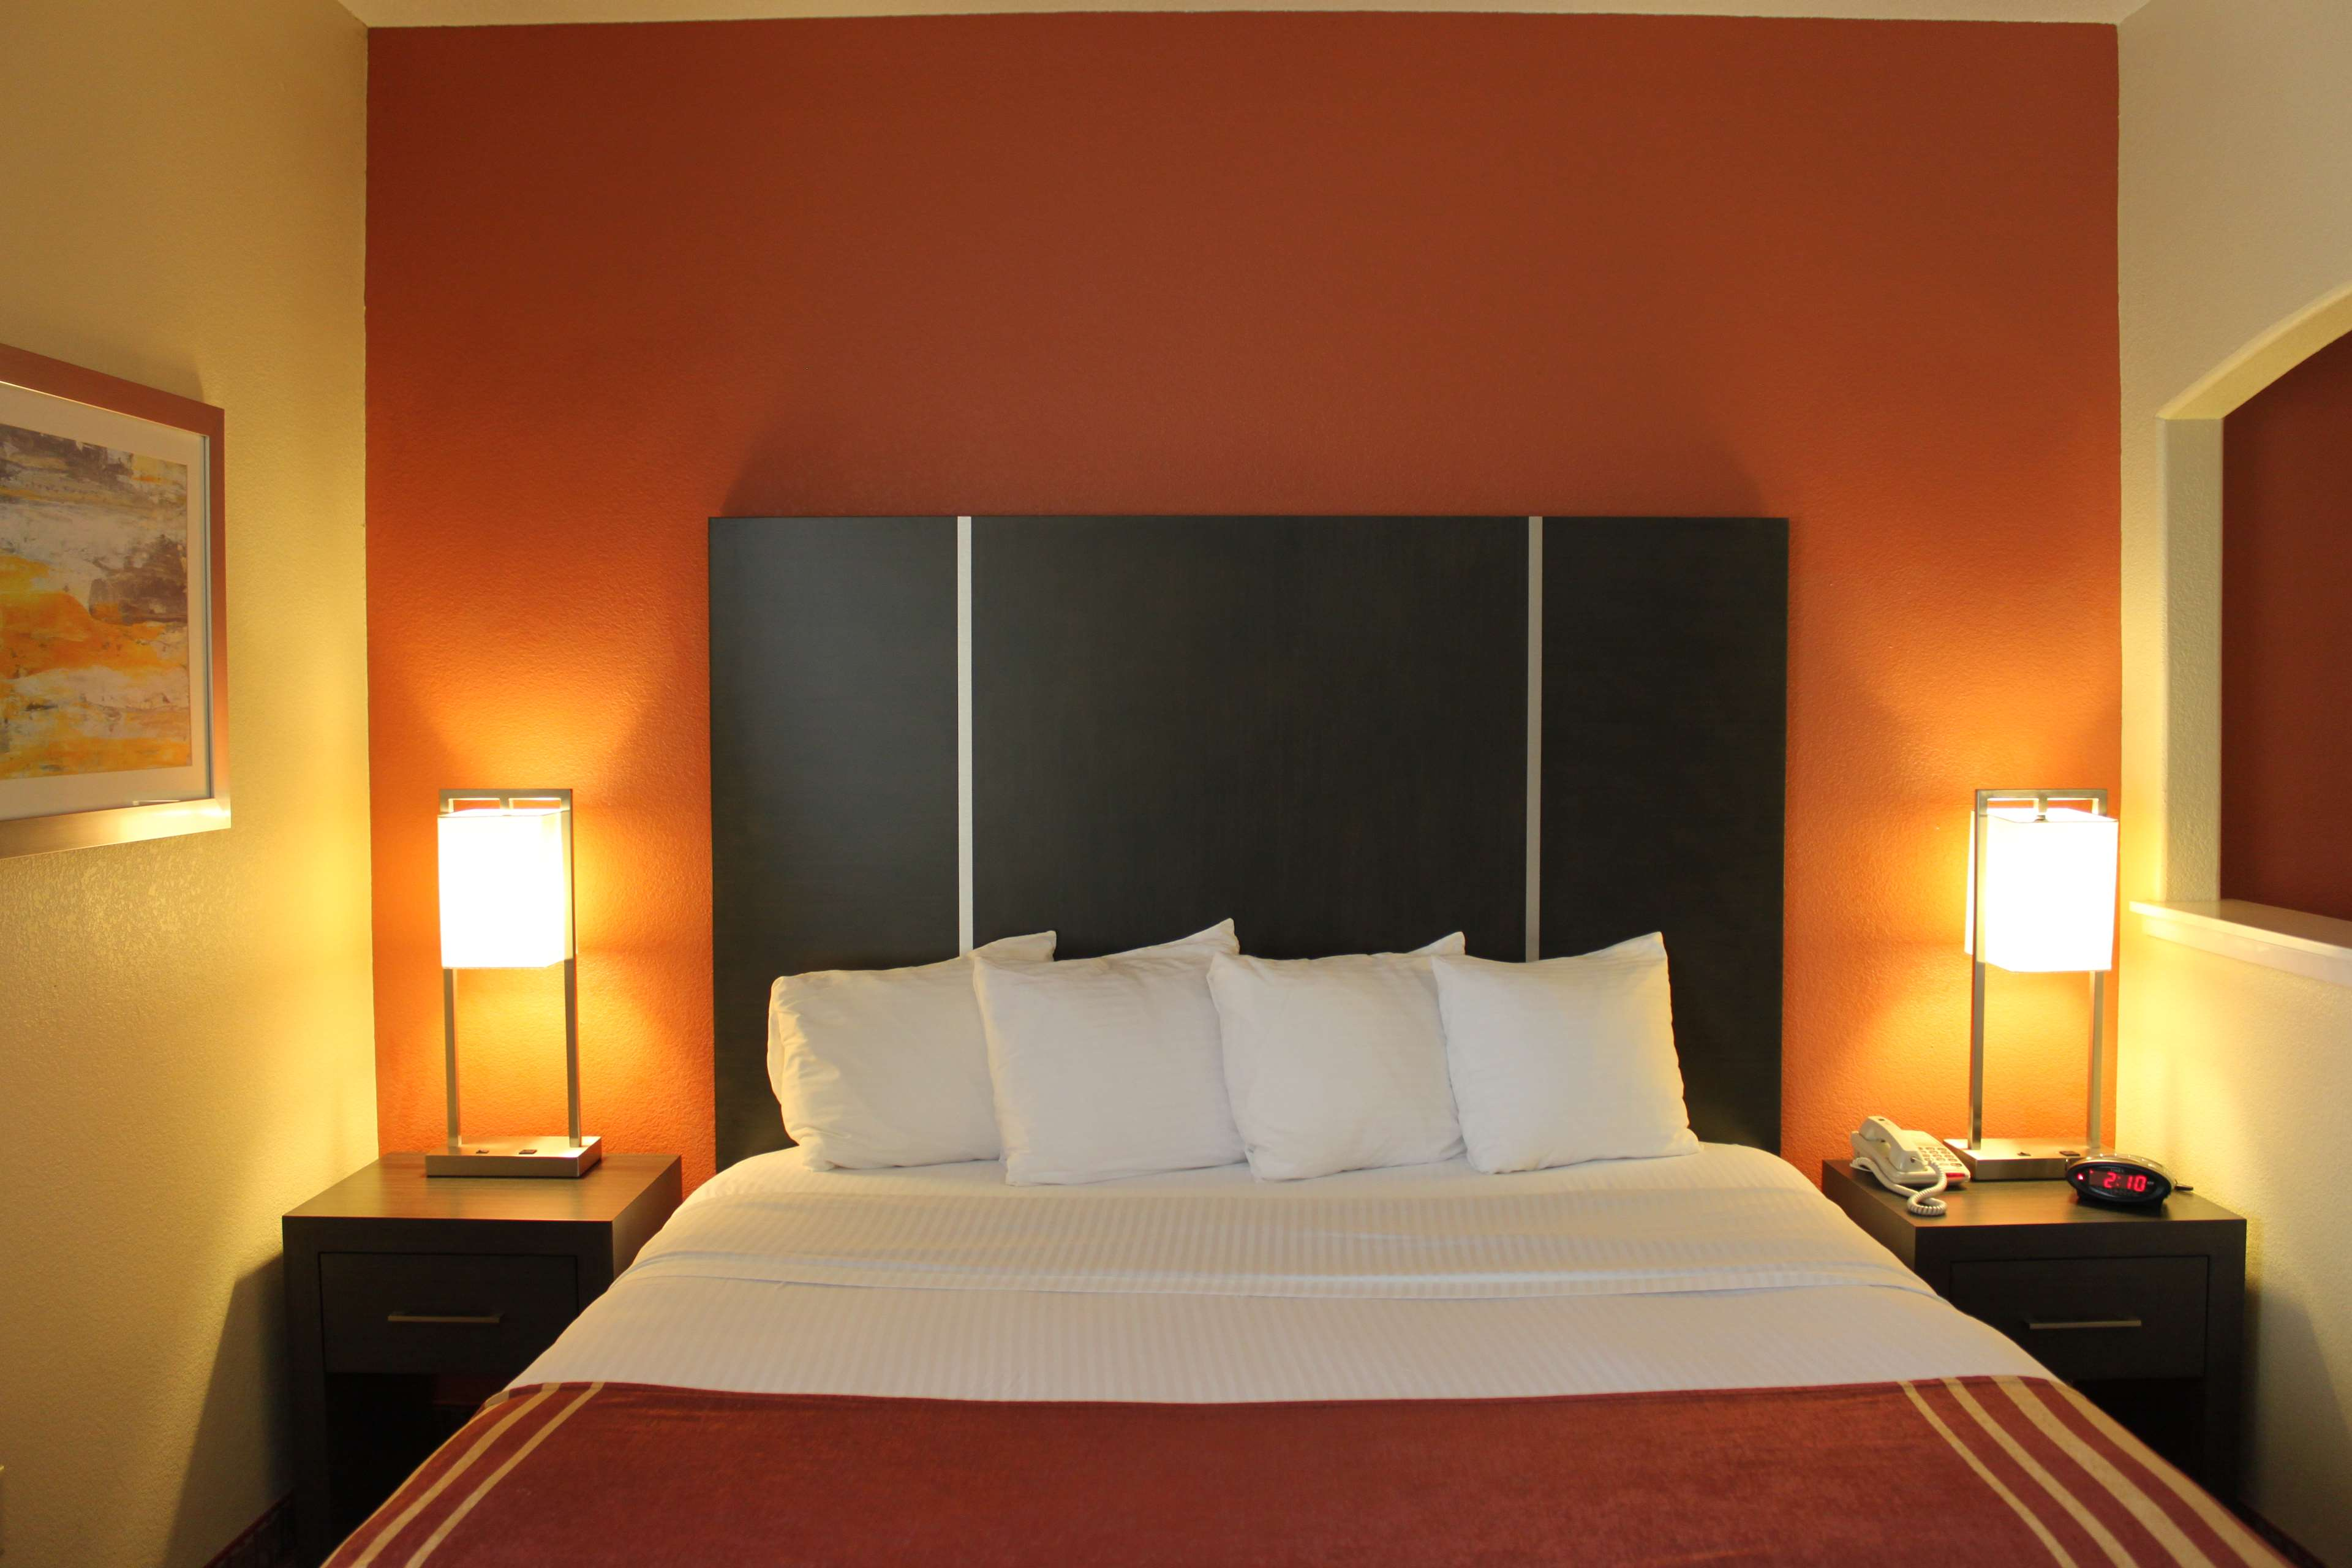 Best Western Plus North Houston Inn & Suites image 17